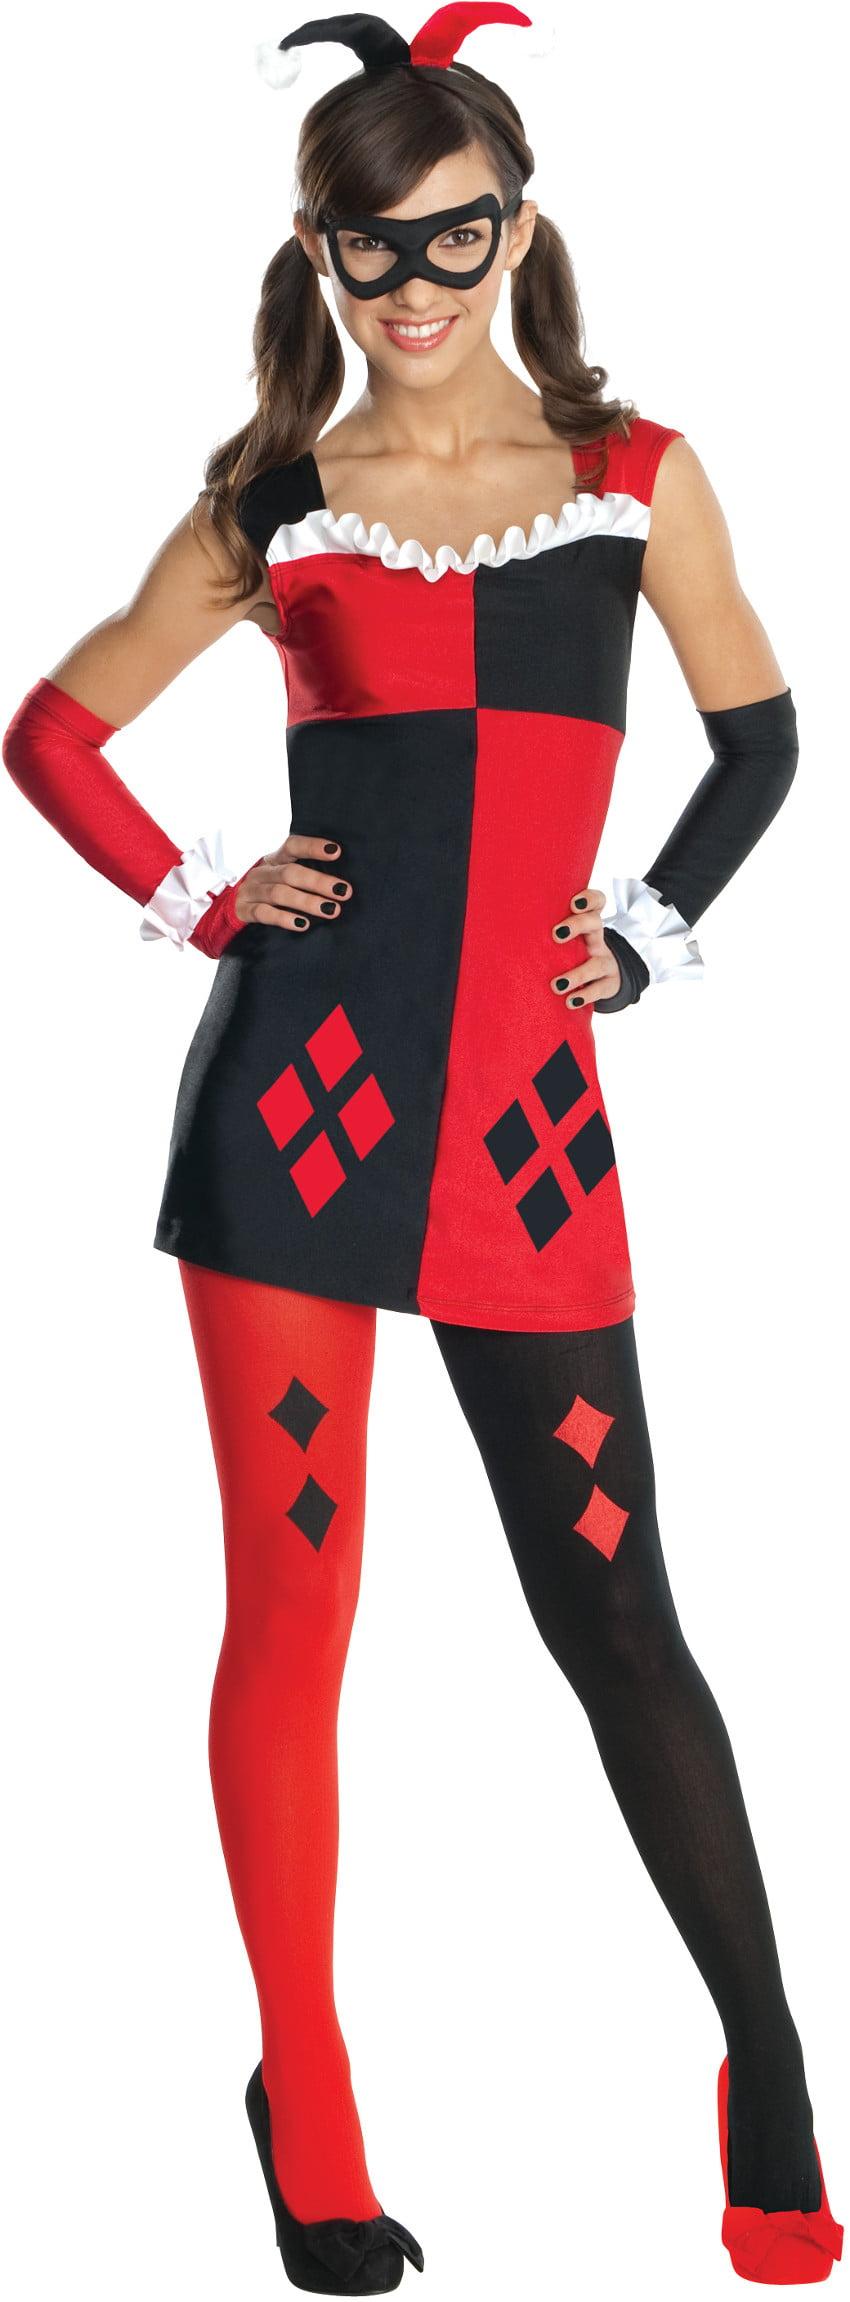 Girls Tween Batman DC Comics Harley Quinn Dress Costume by Rubies